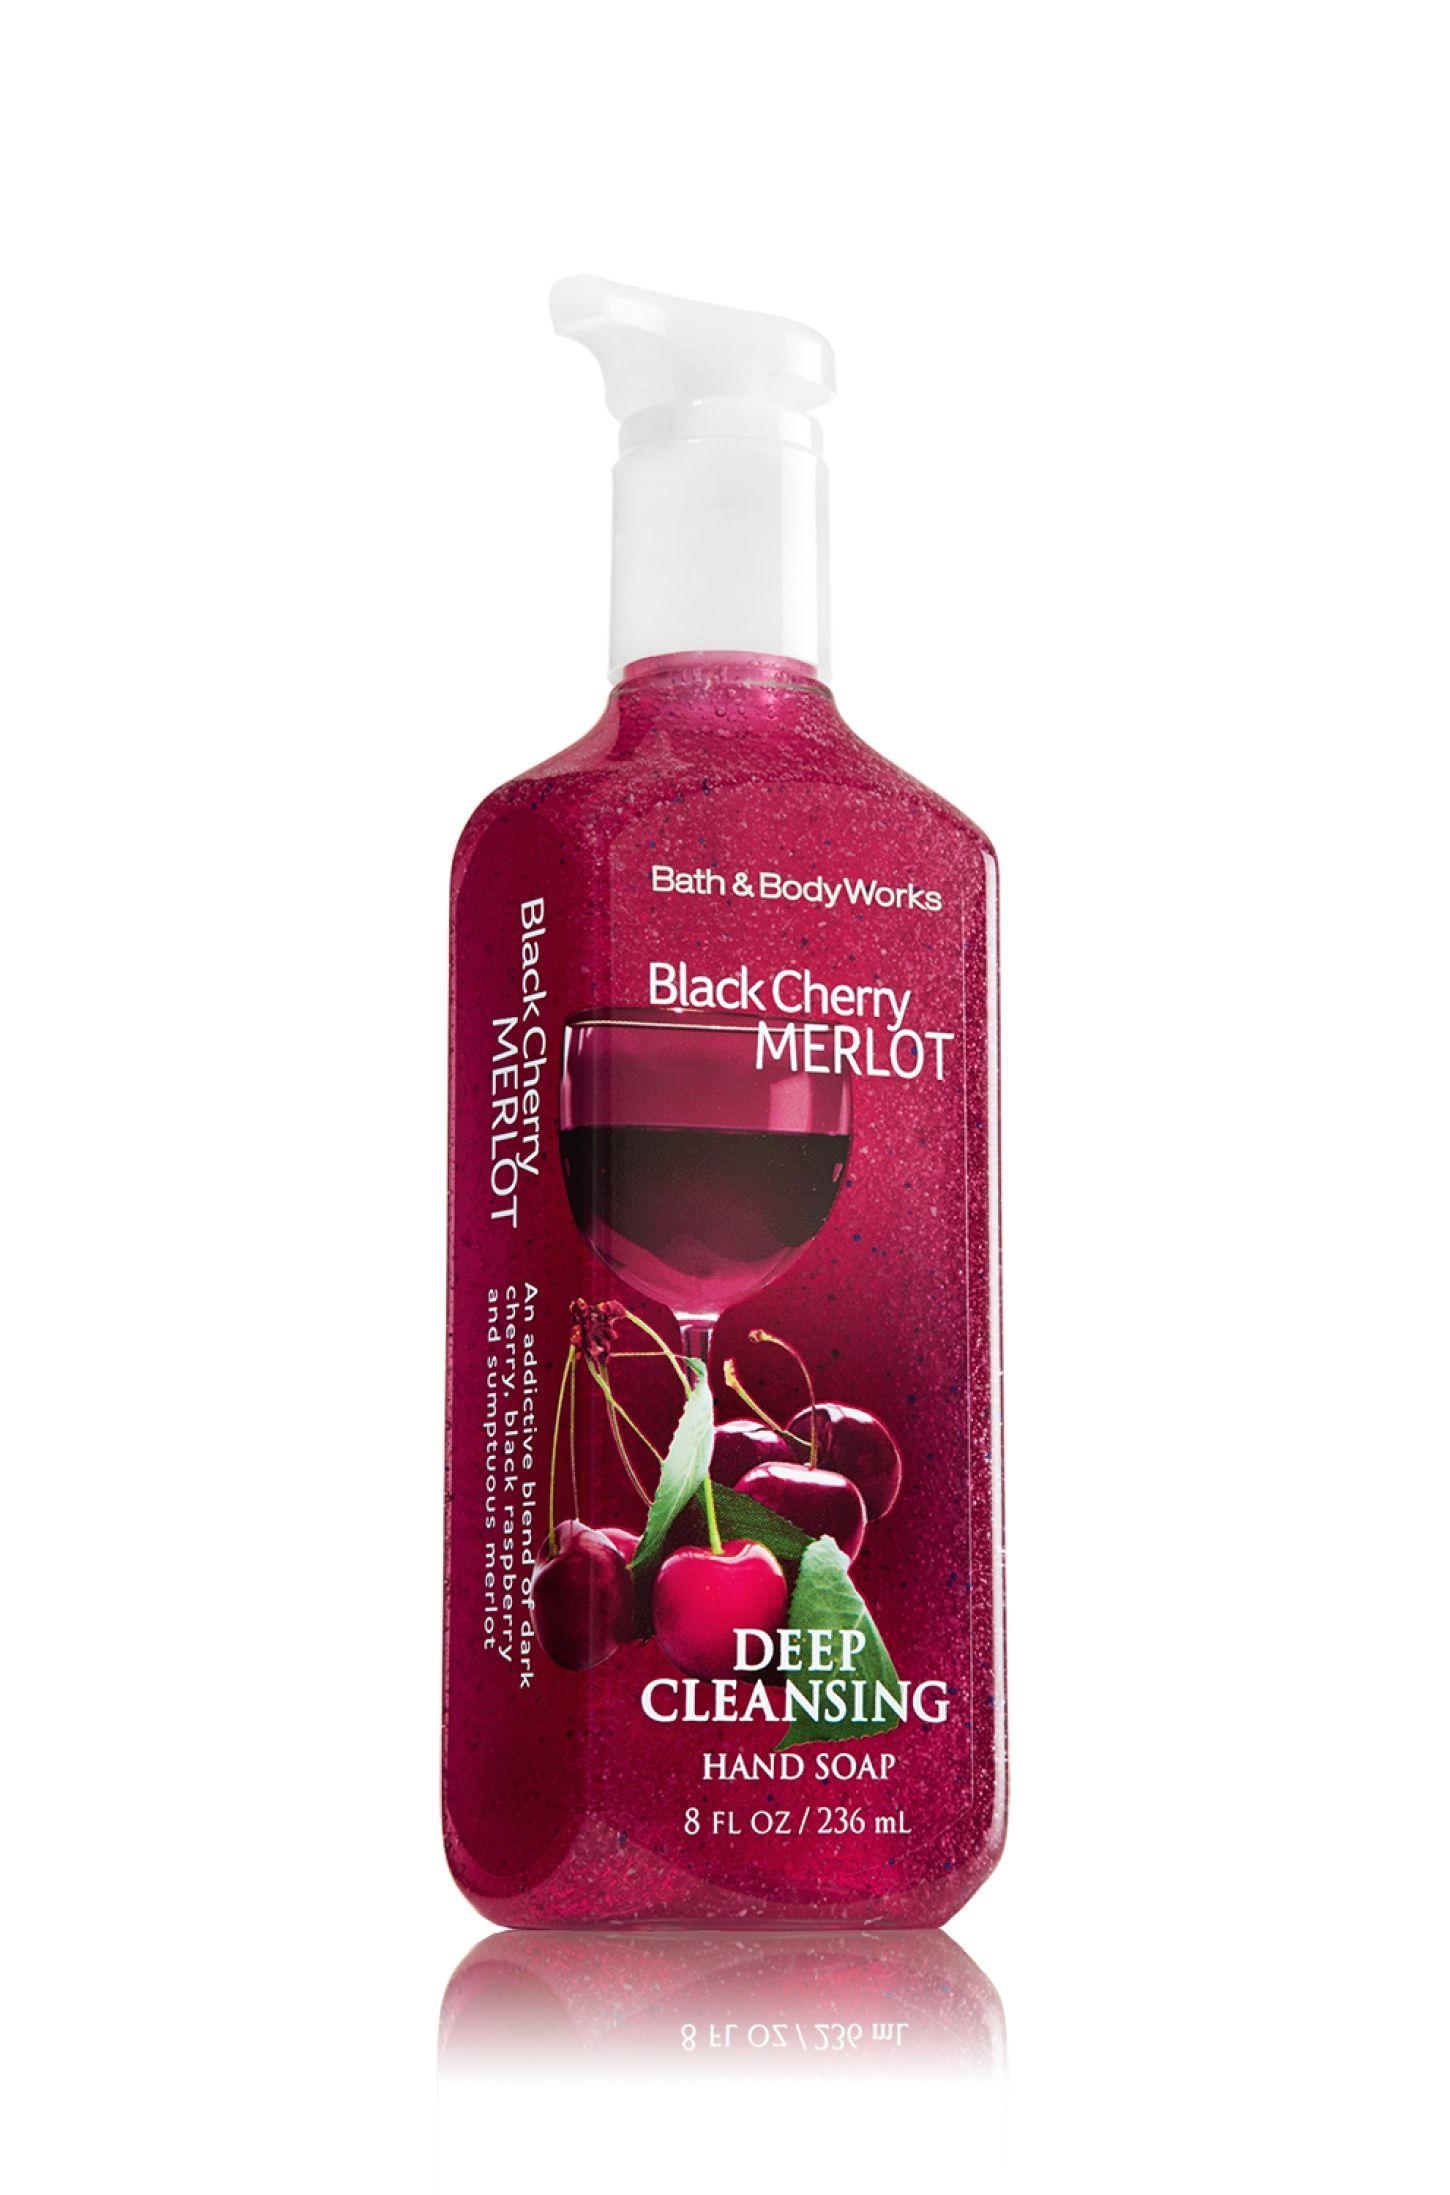 Black Cherry Merlot Deep Cleansing Hand Soap Soap Sanitizer